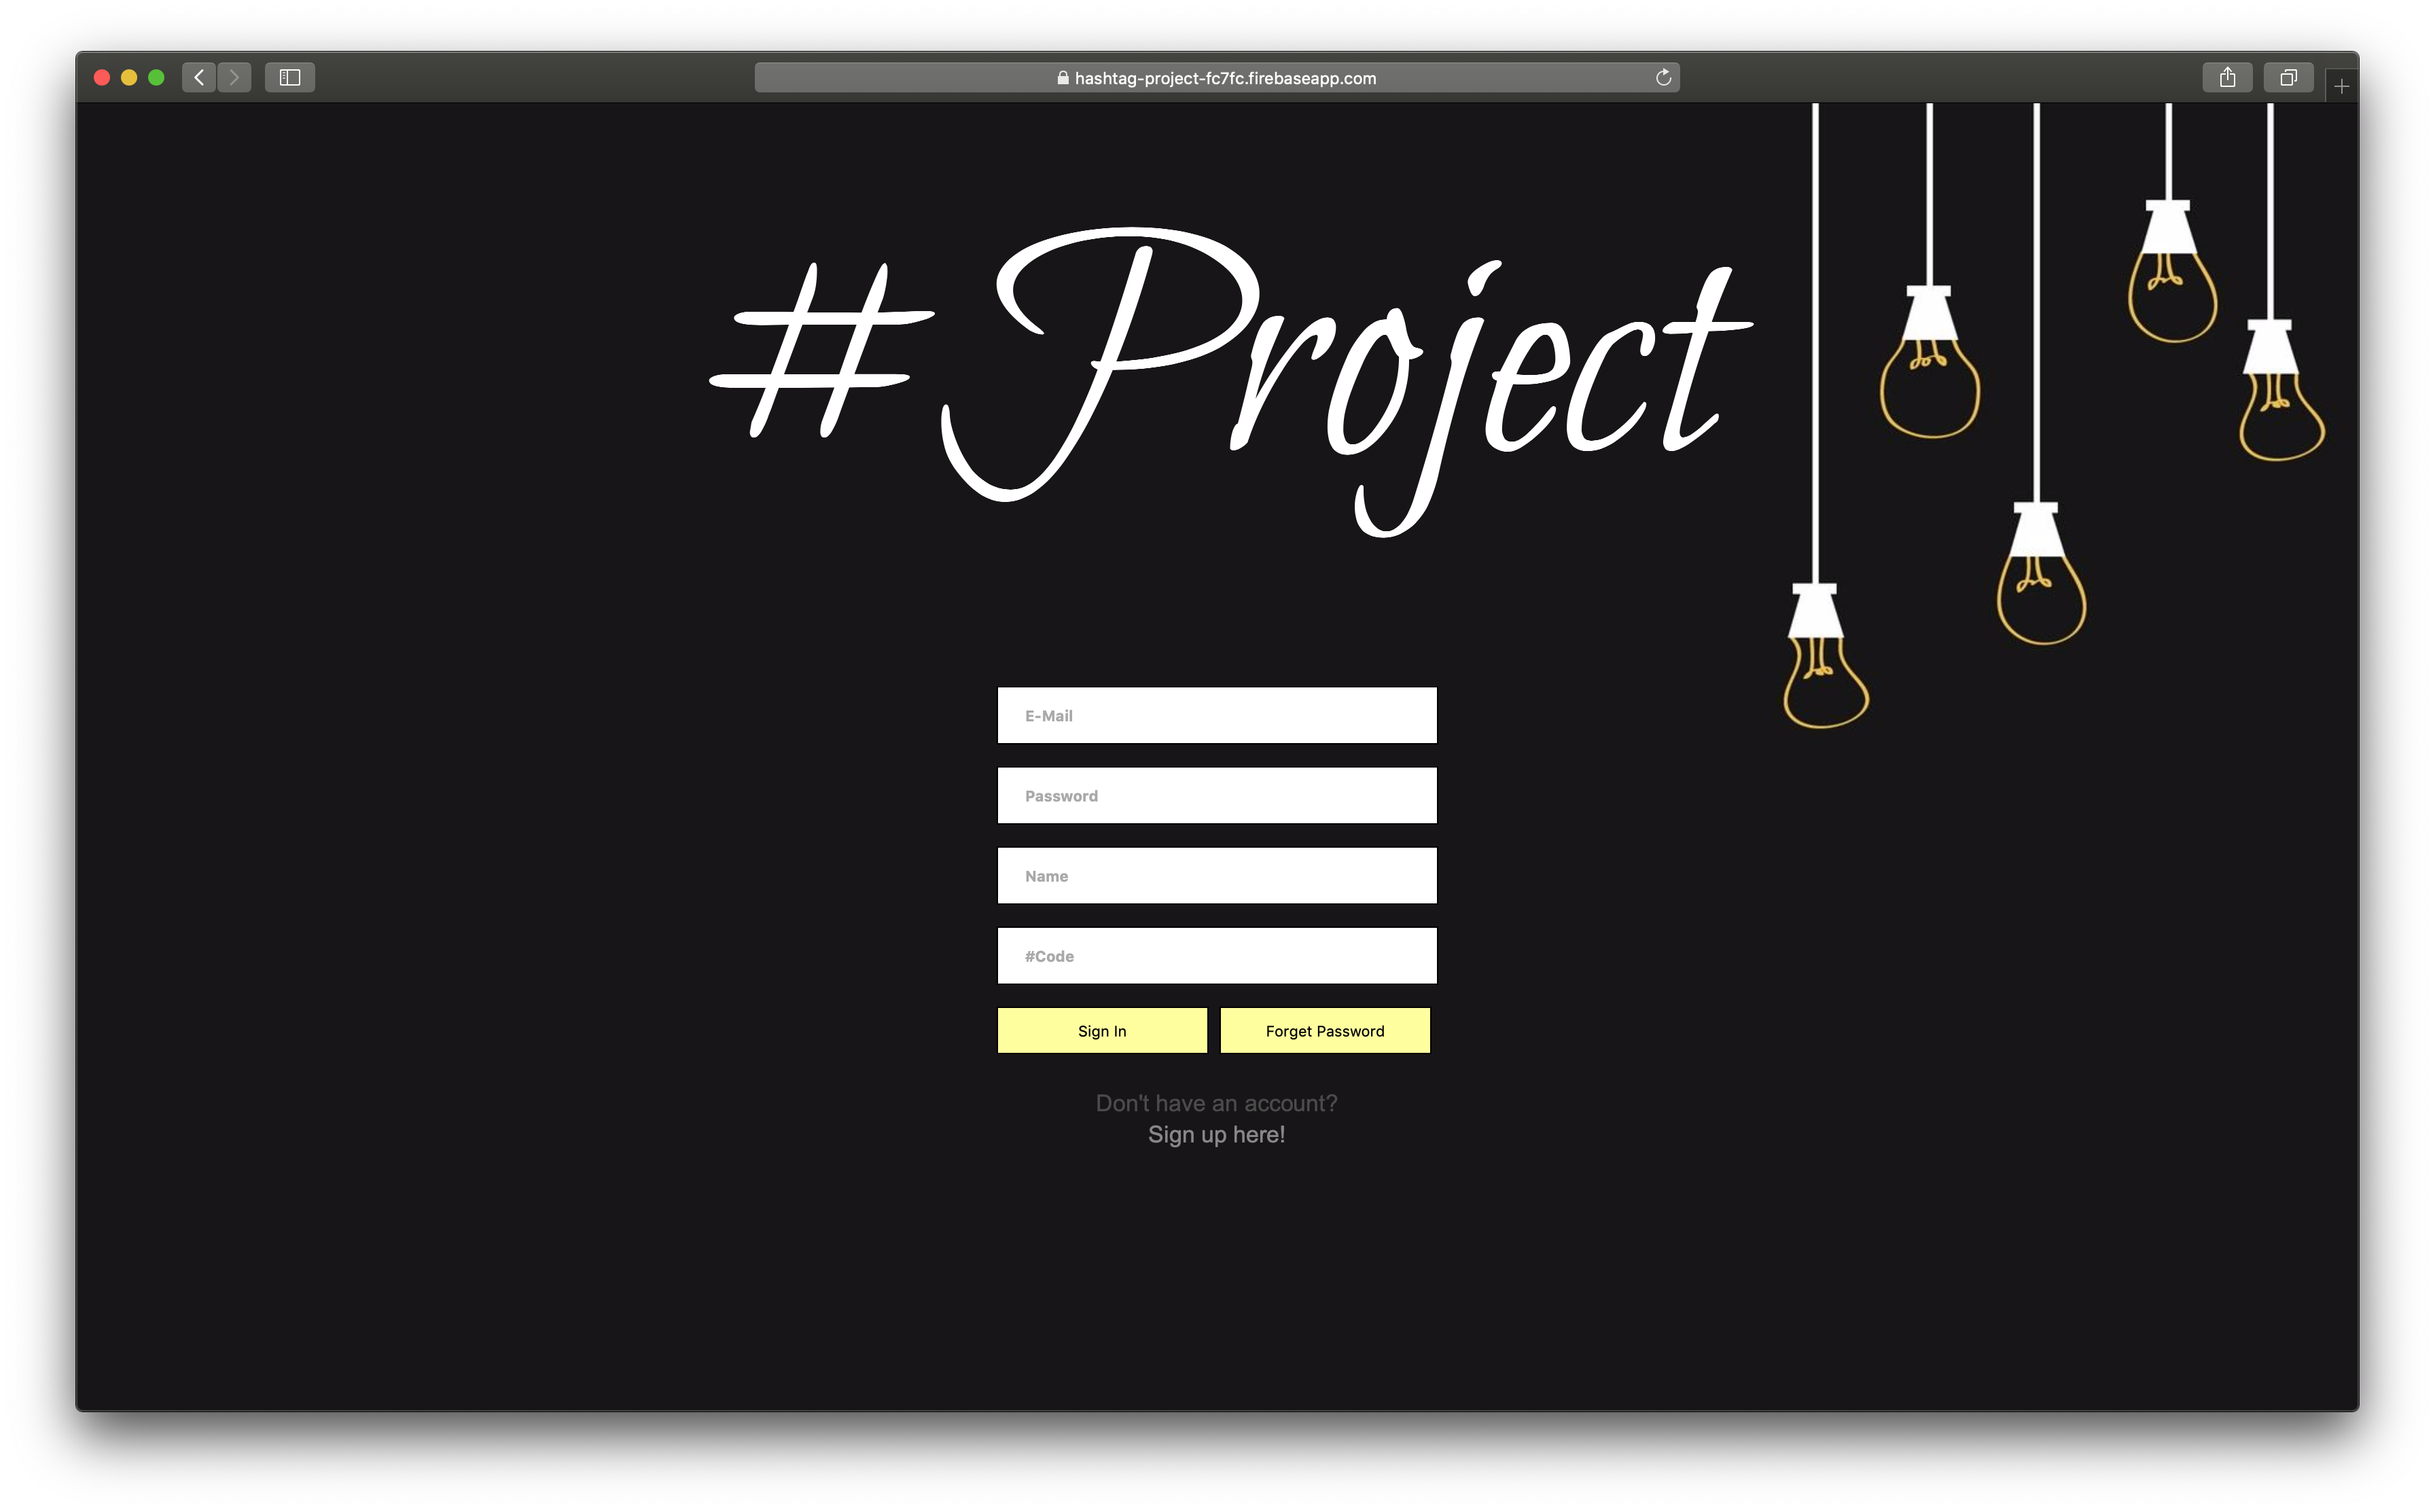 hightechu-academy-hashtagproject